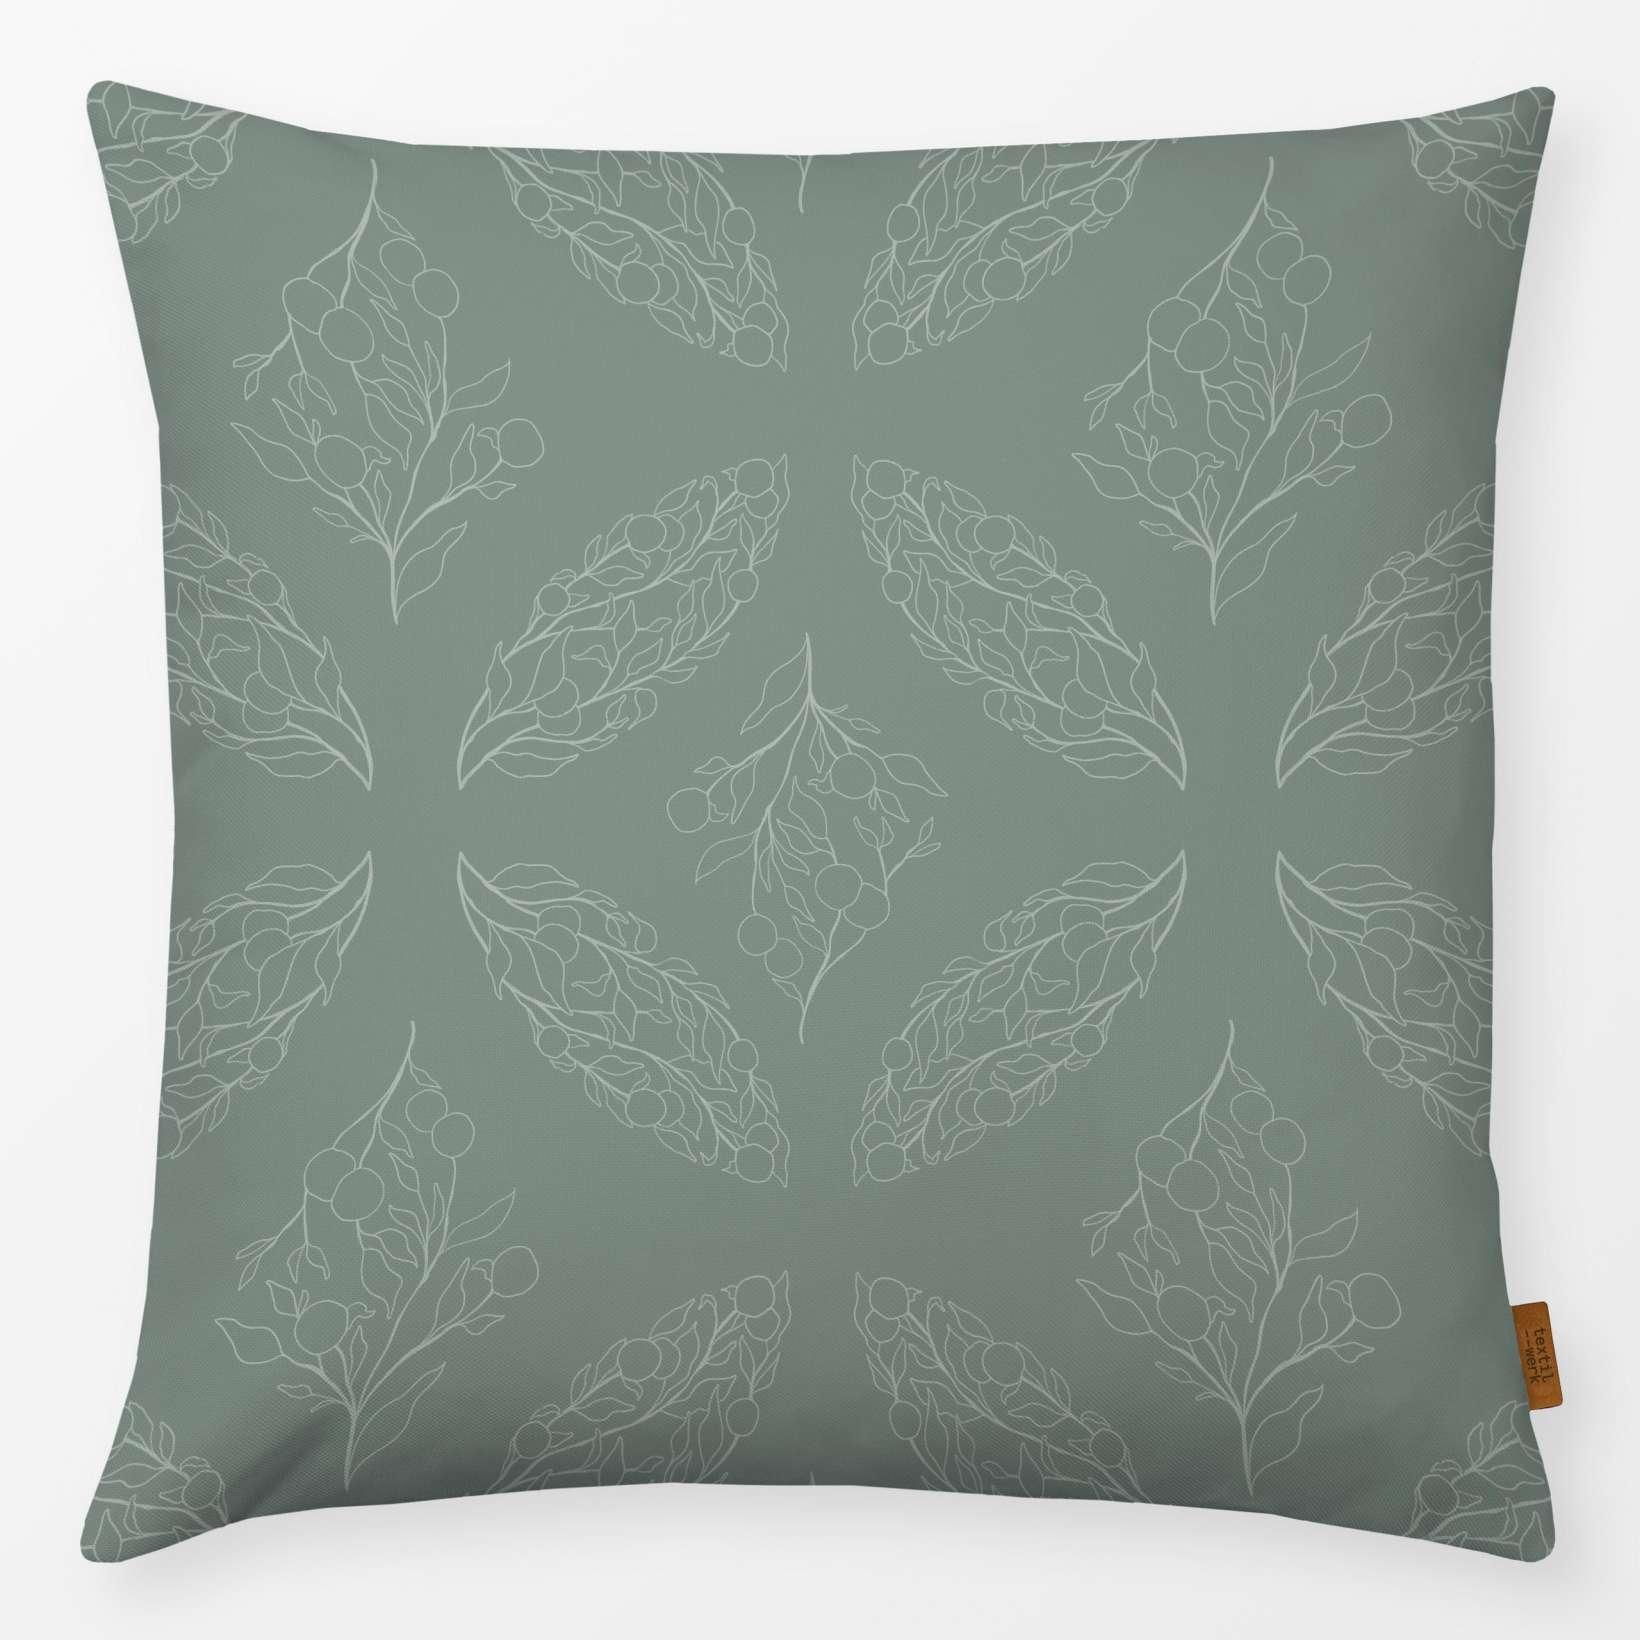 Kissen Leaves & Olive 40x40cm